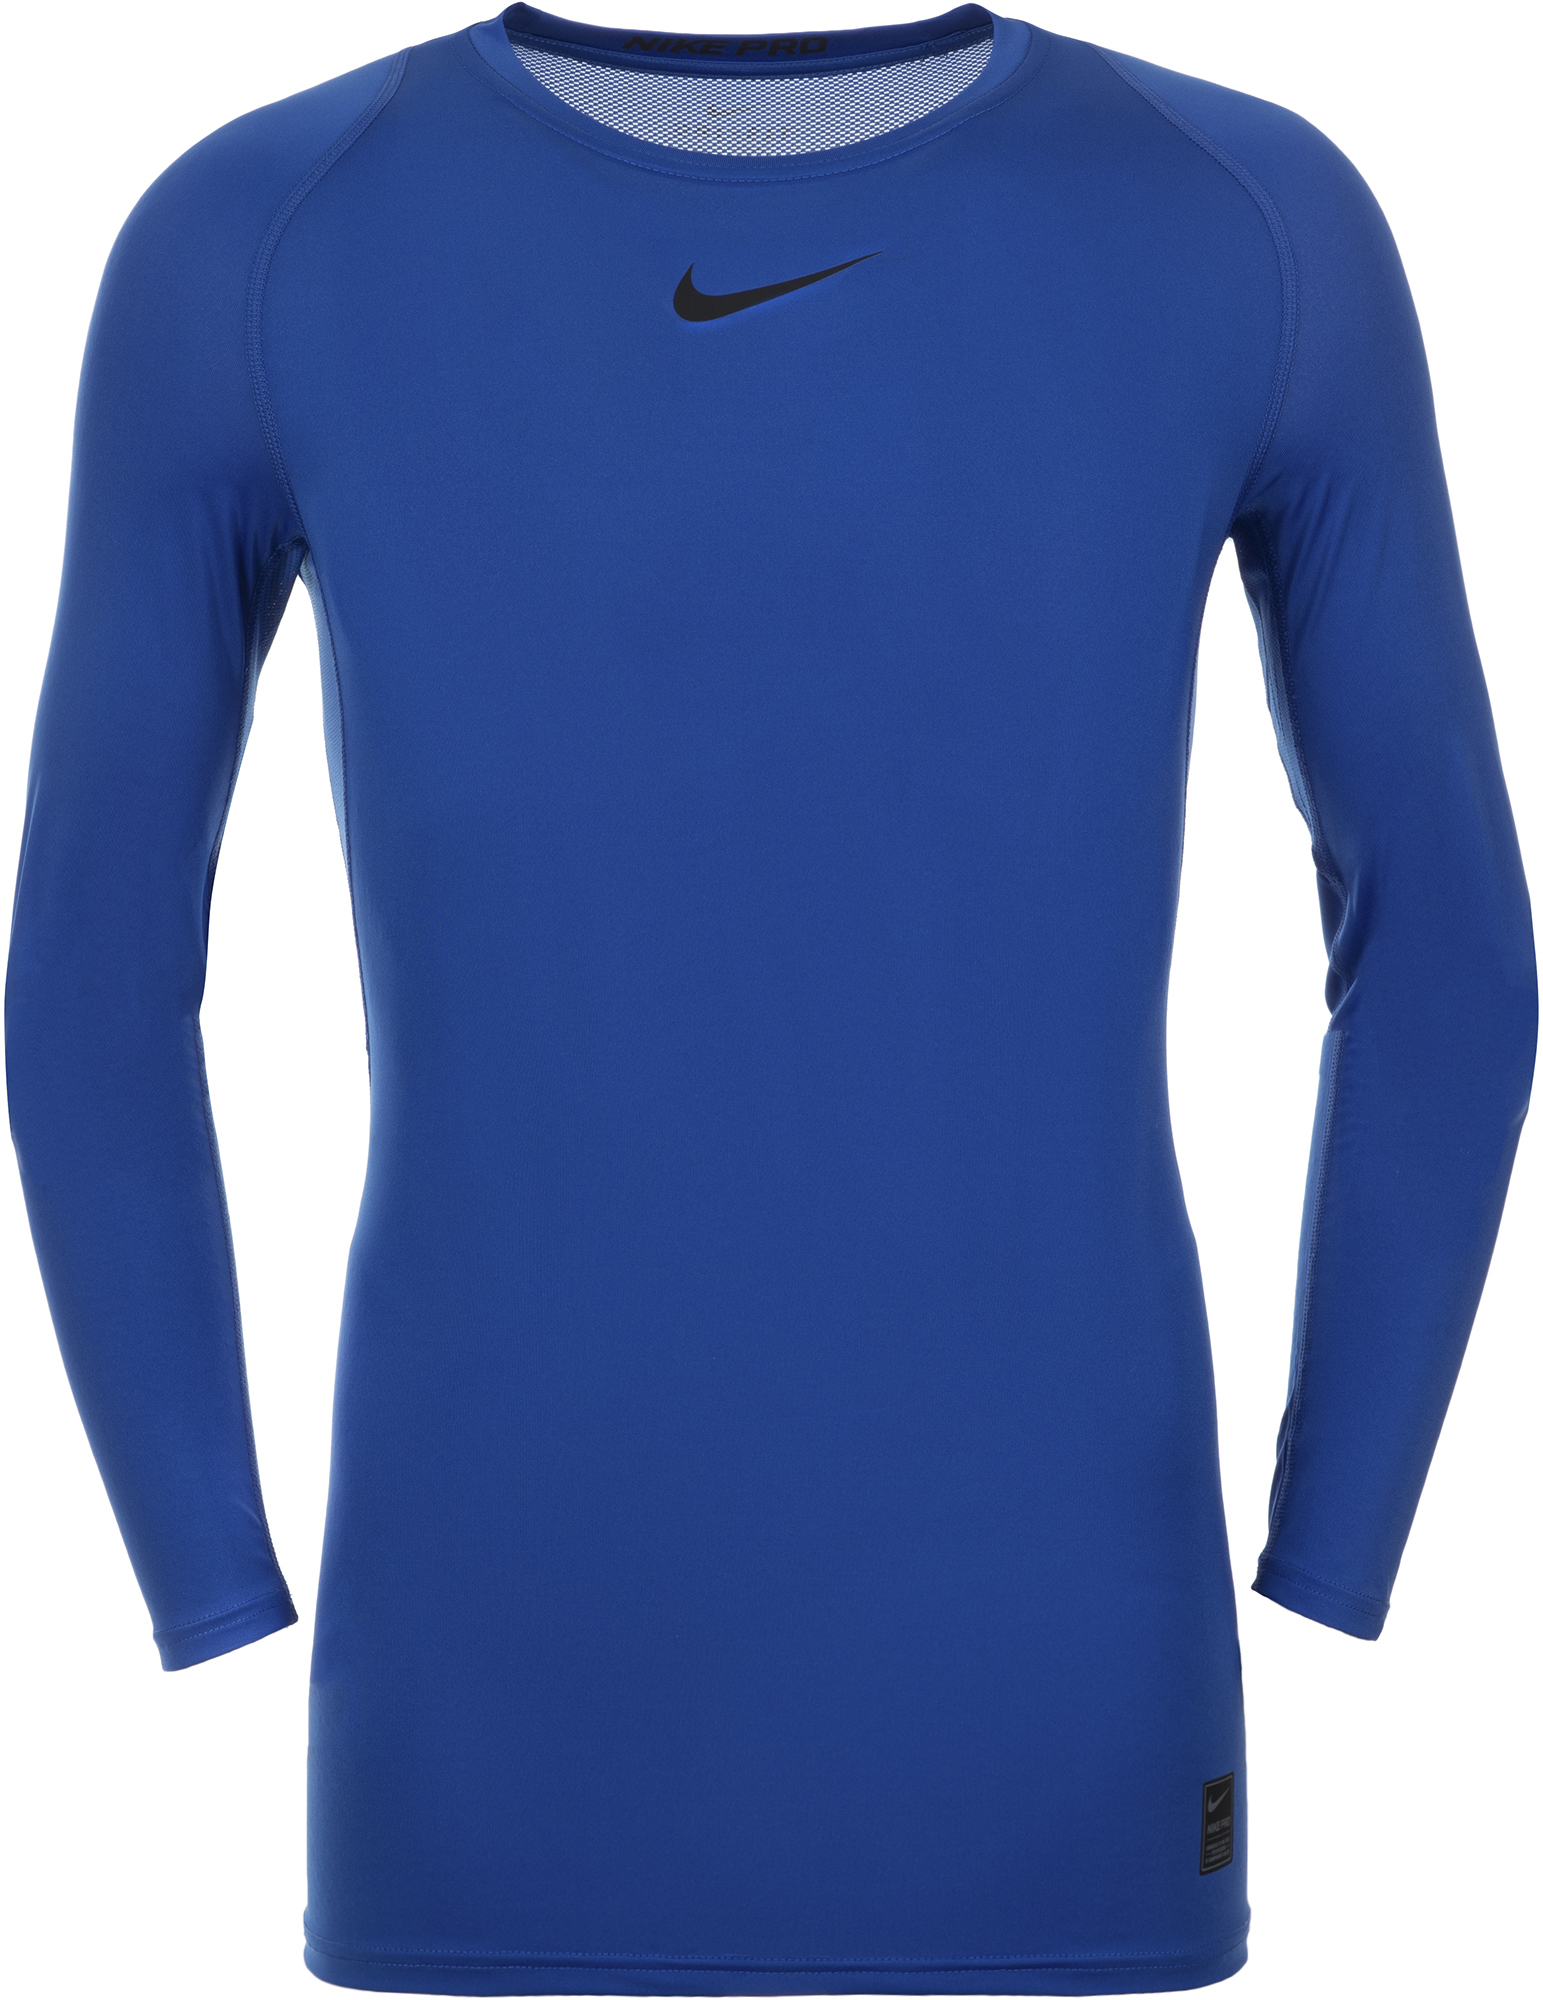 Фото Nike Футболка с длинным рукавом мужская Nike Pro, размер 52-54